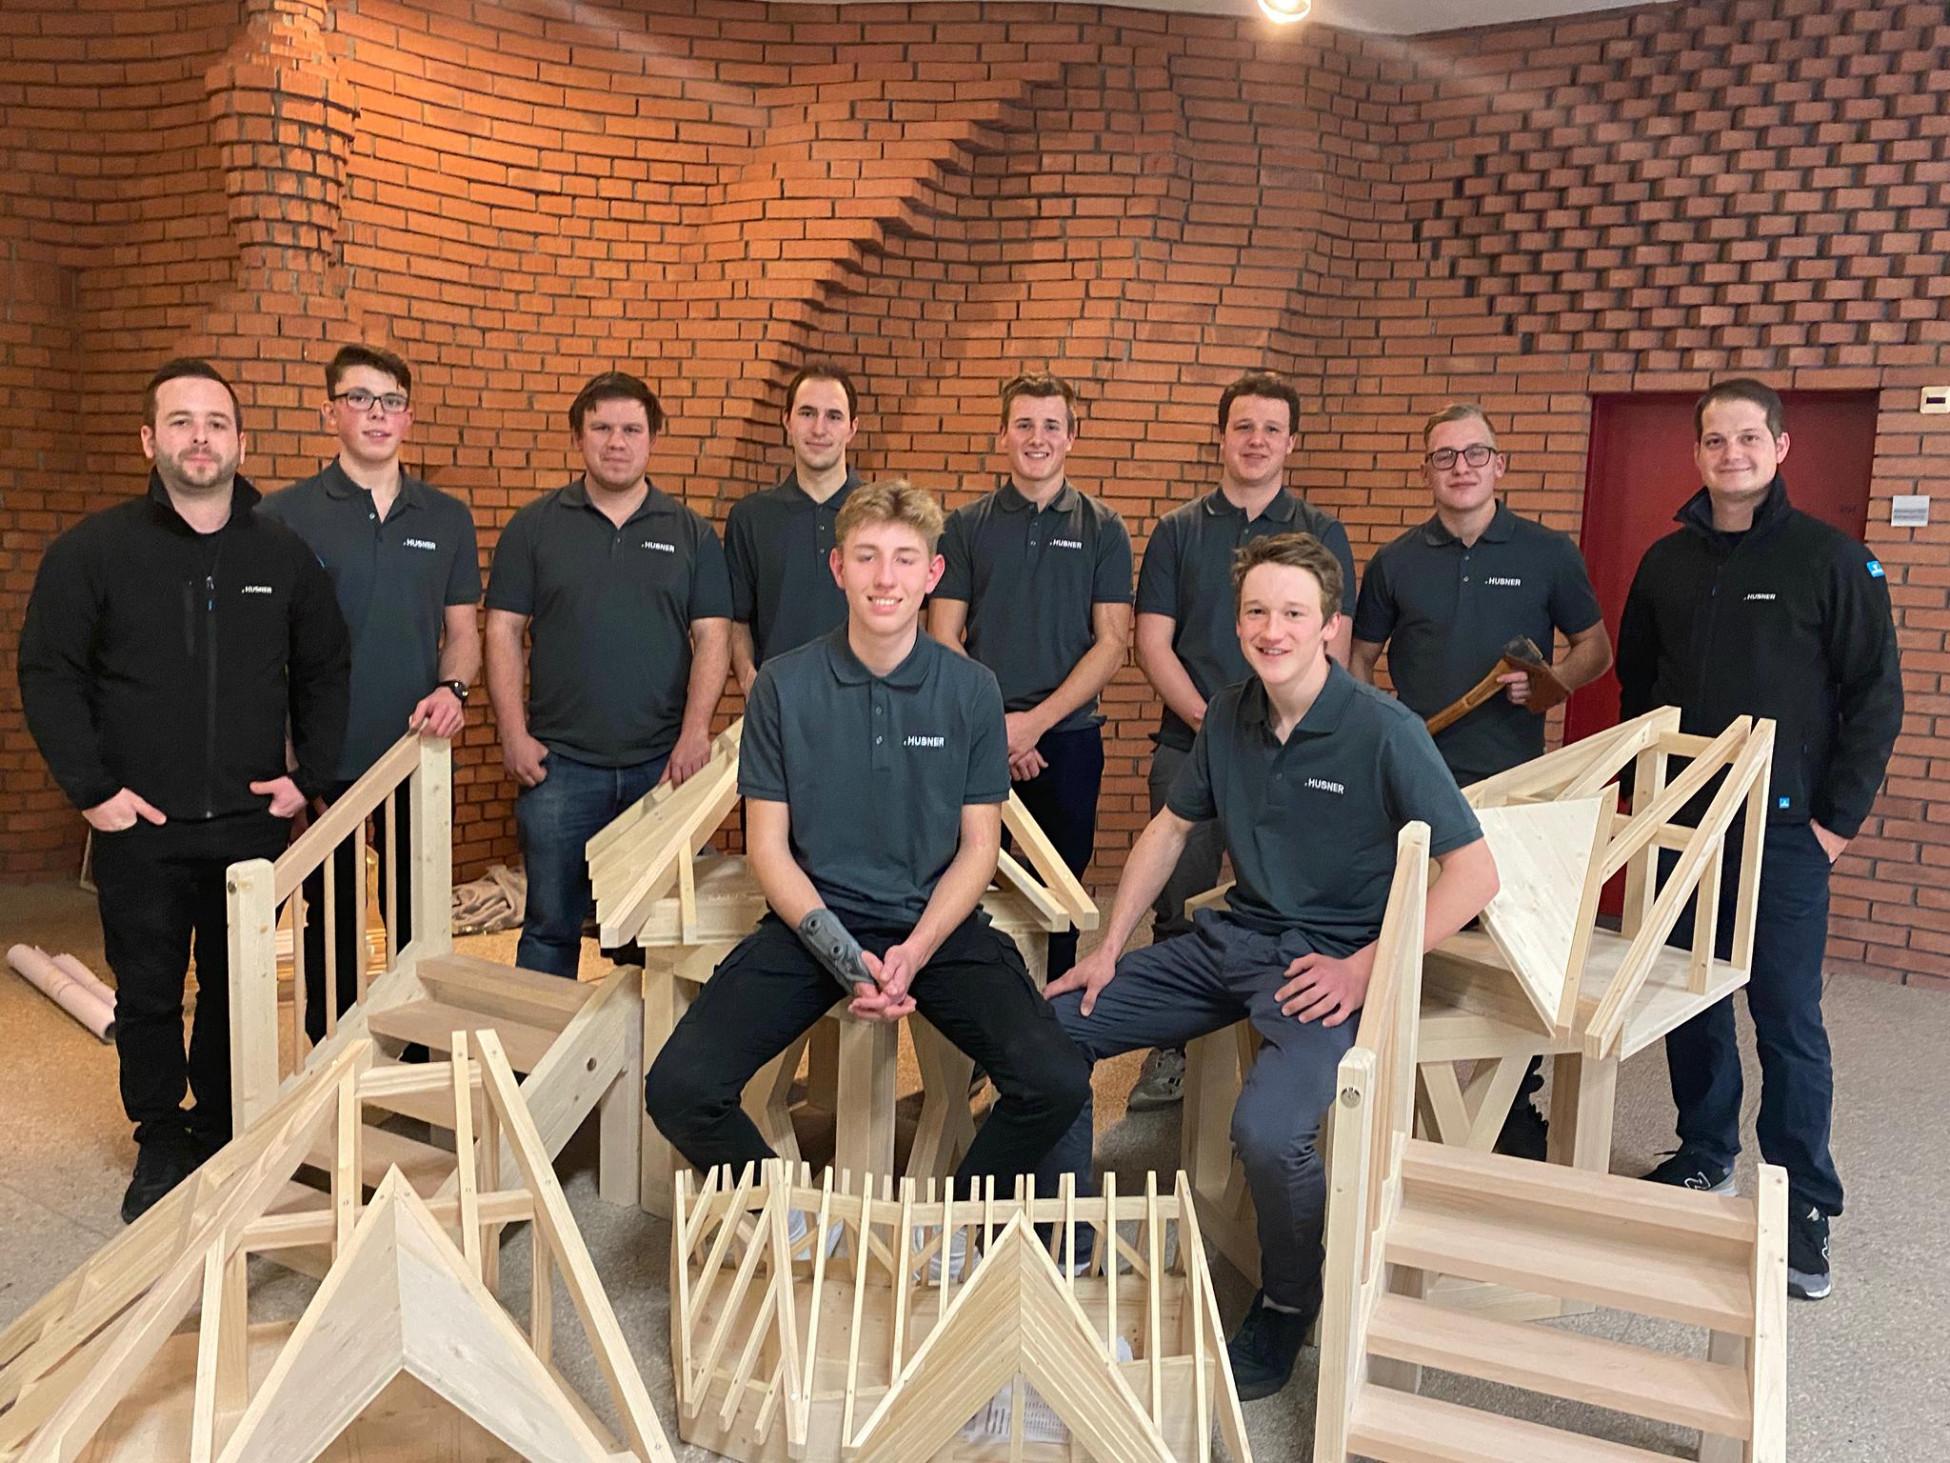 Lehrlingswettbewerb 2020 Holzbau Schweiz Sektion Aargau